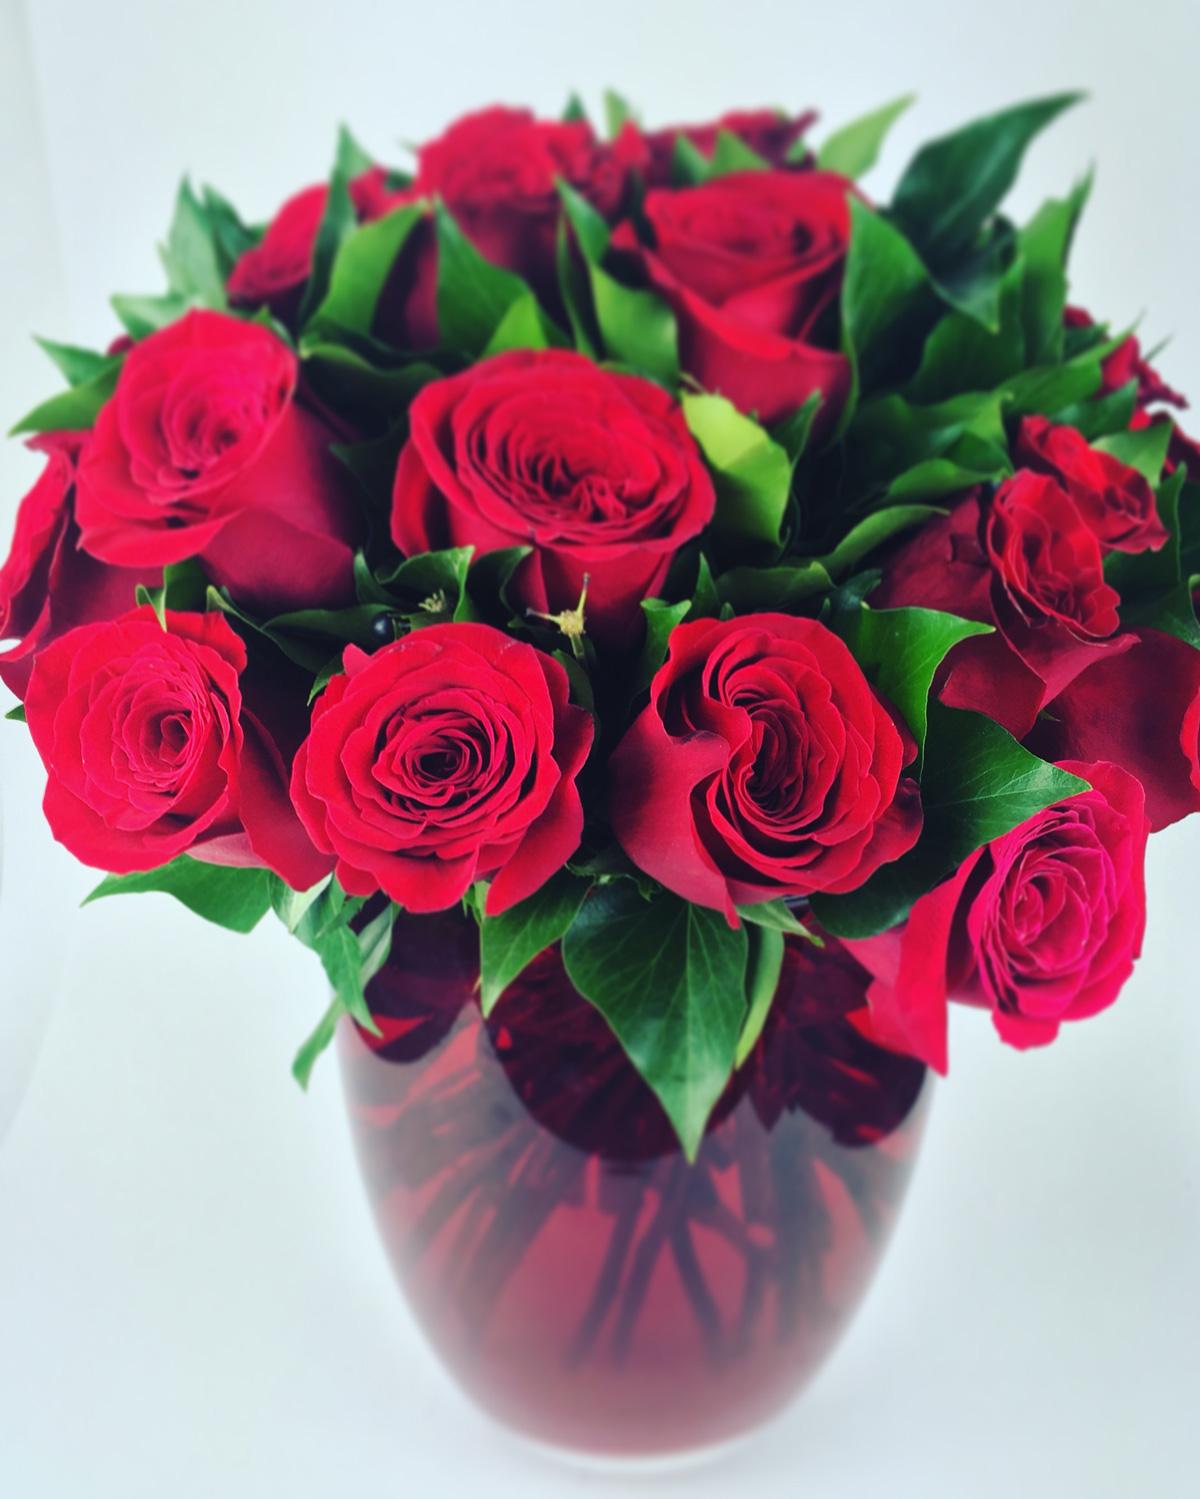 150 nuances de rose paris fleuri fleuriste prestige livraison interflora. Black Bedroom Furniture Sets. Home Design Ideas